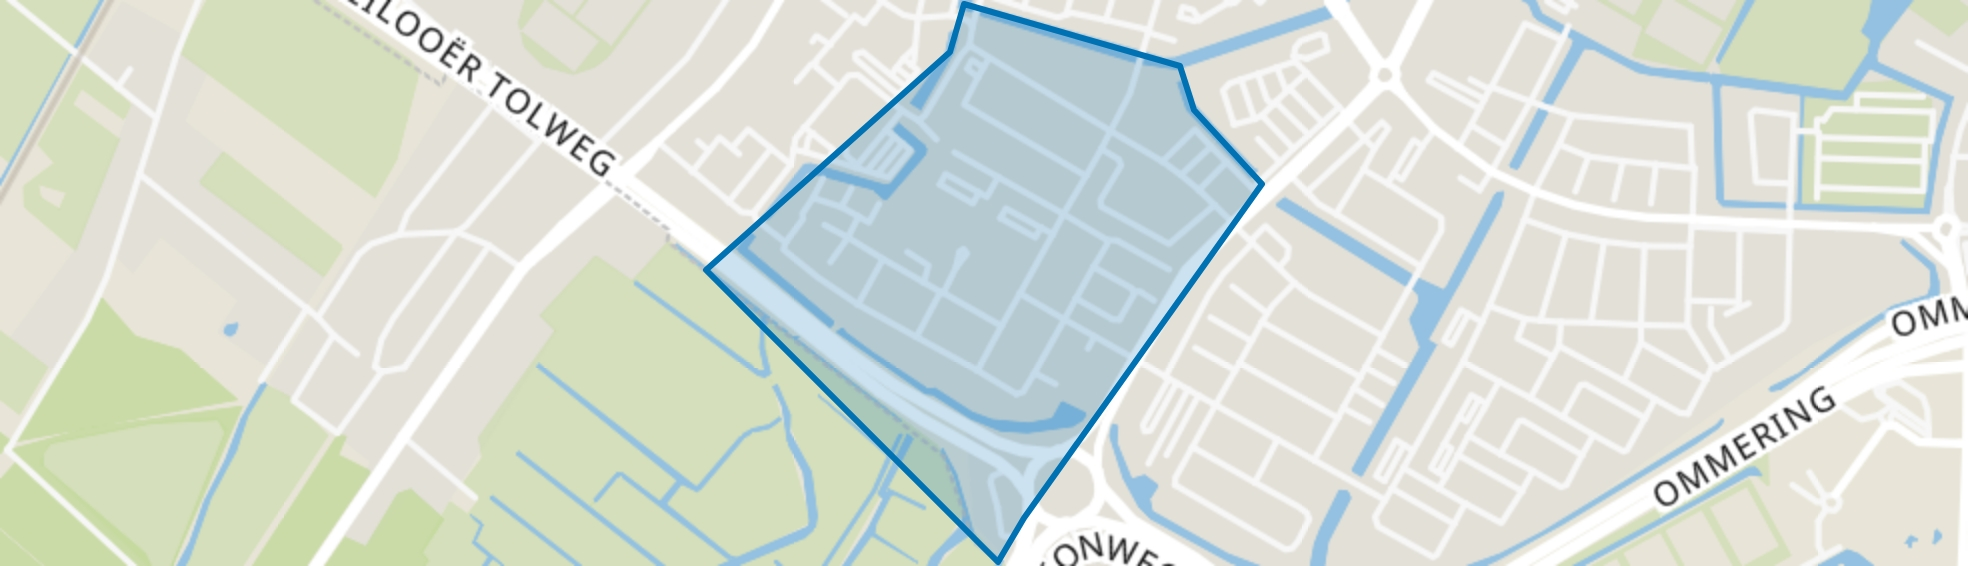 Kooimeer, Alkmaar map